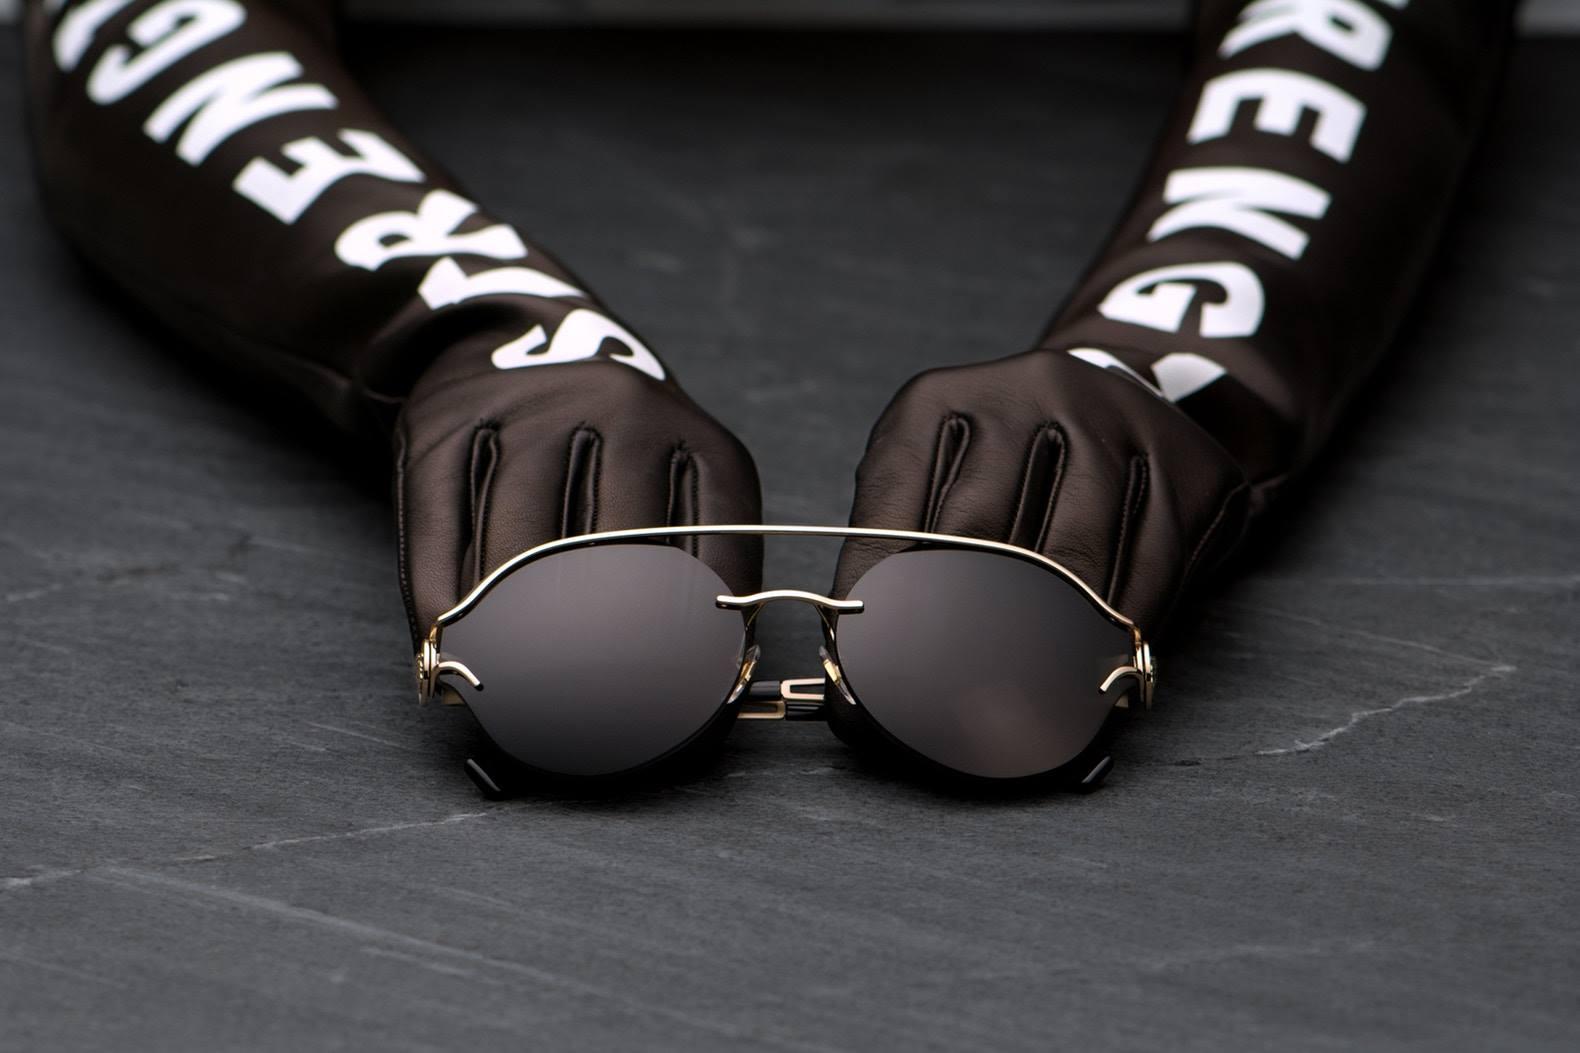 Versace | 'Versace Manifesto' Eyewear 2017 Ad Campaign